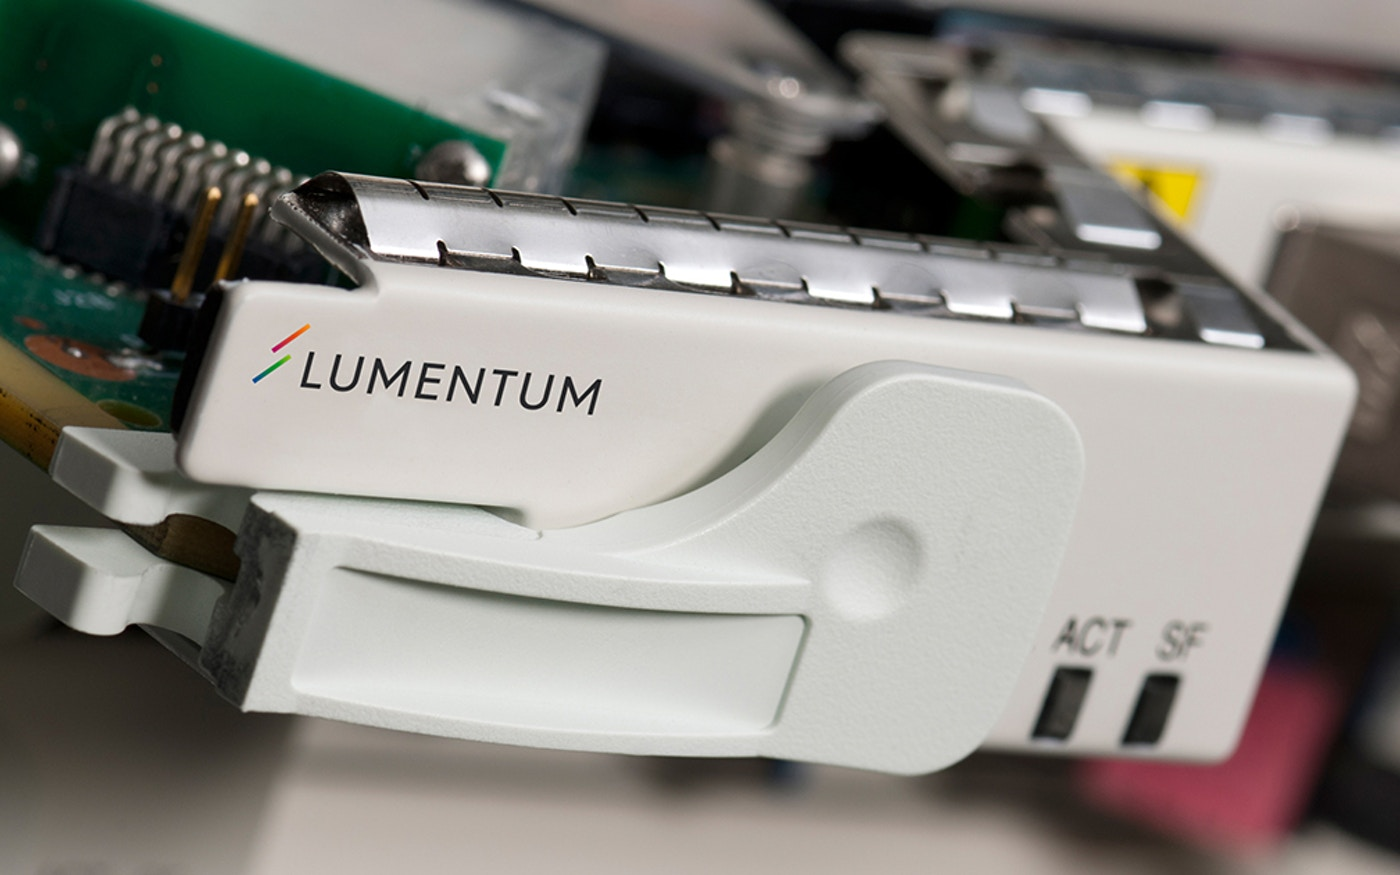 Lumentum branded equipment